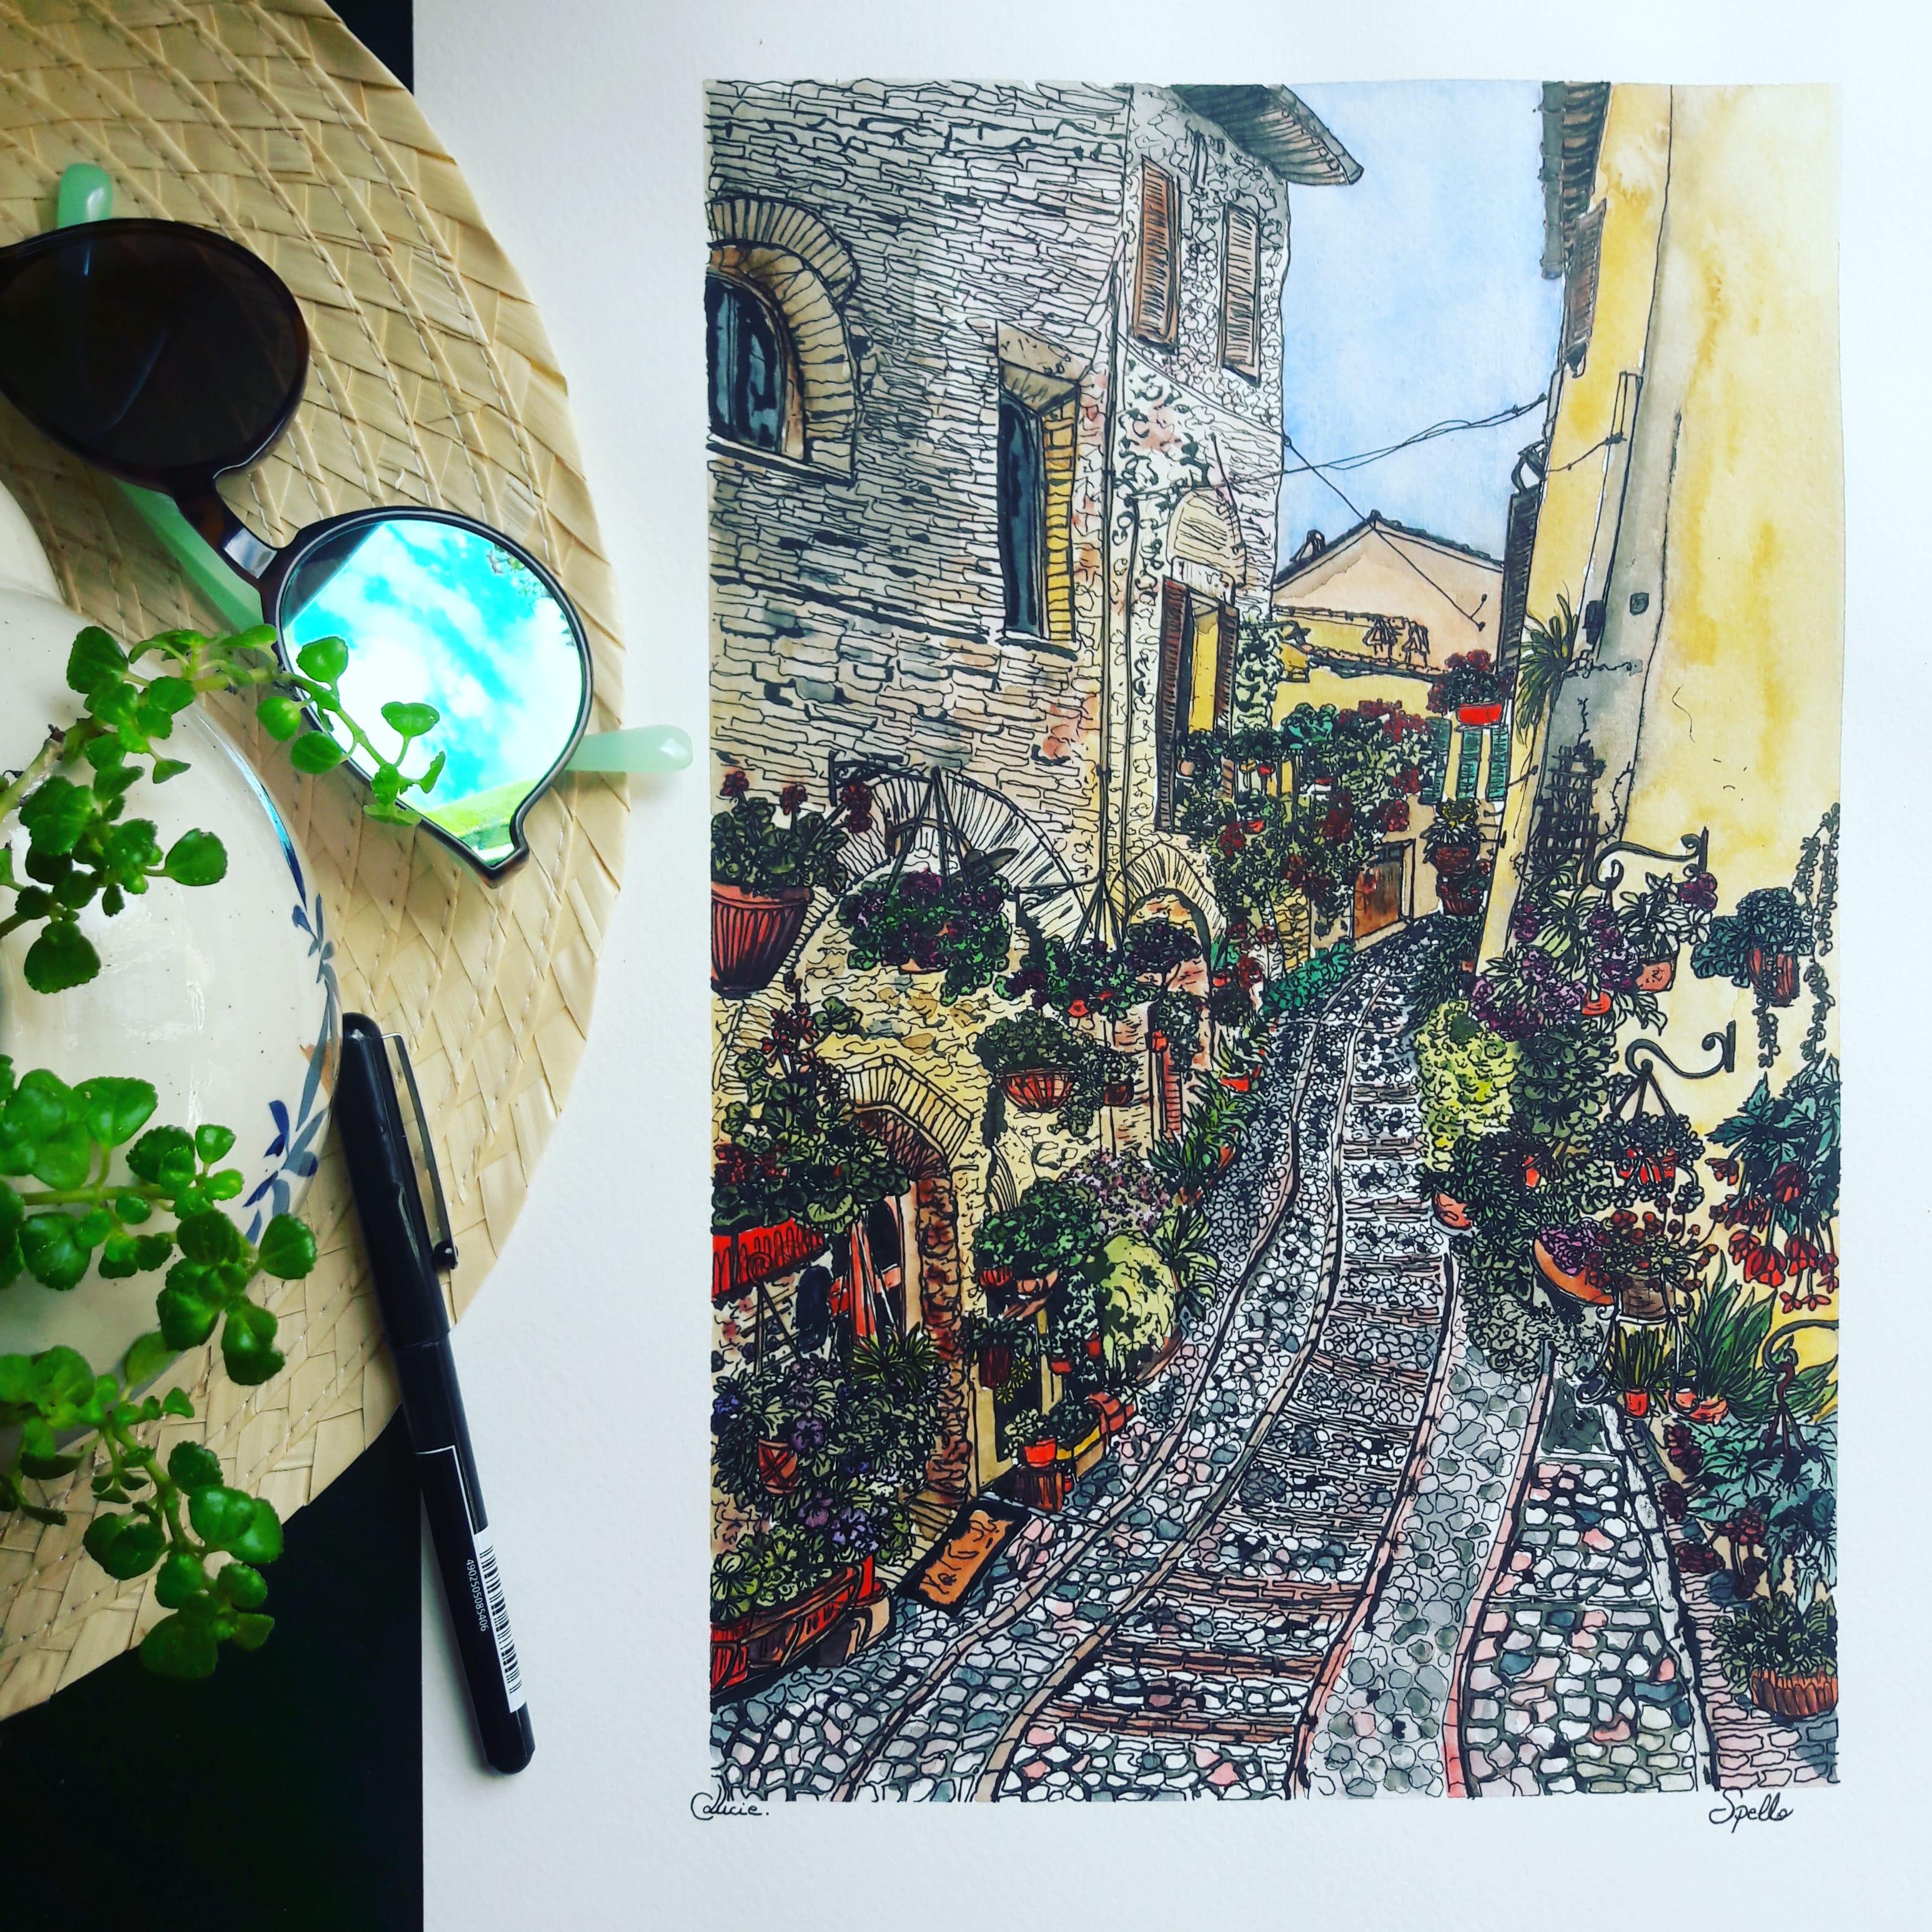 Une ruelle du villa de Spello en Italie